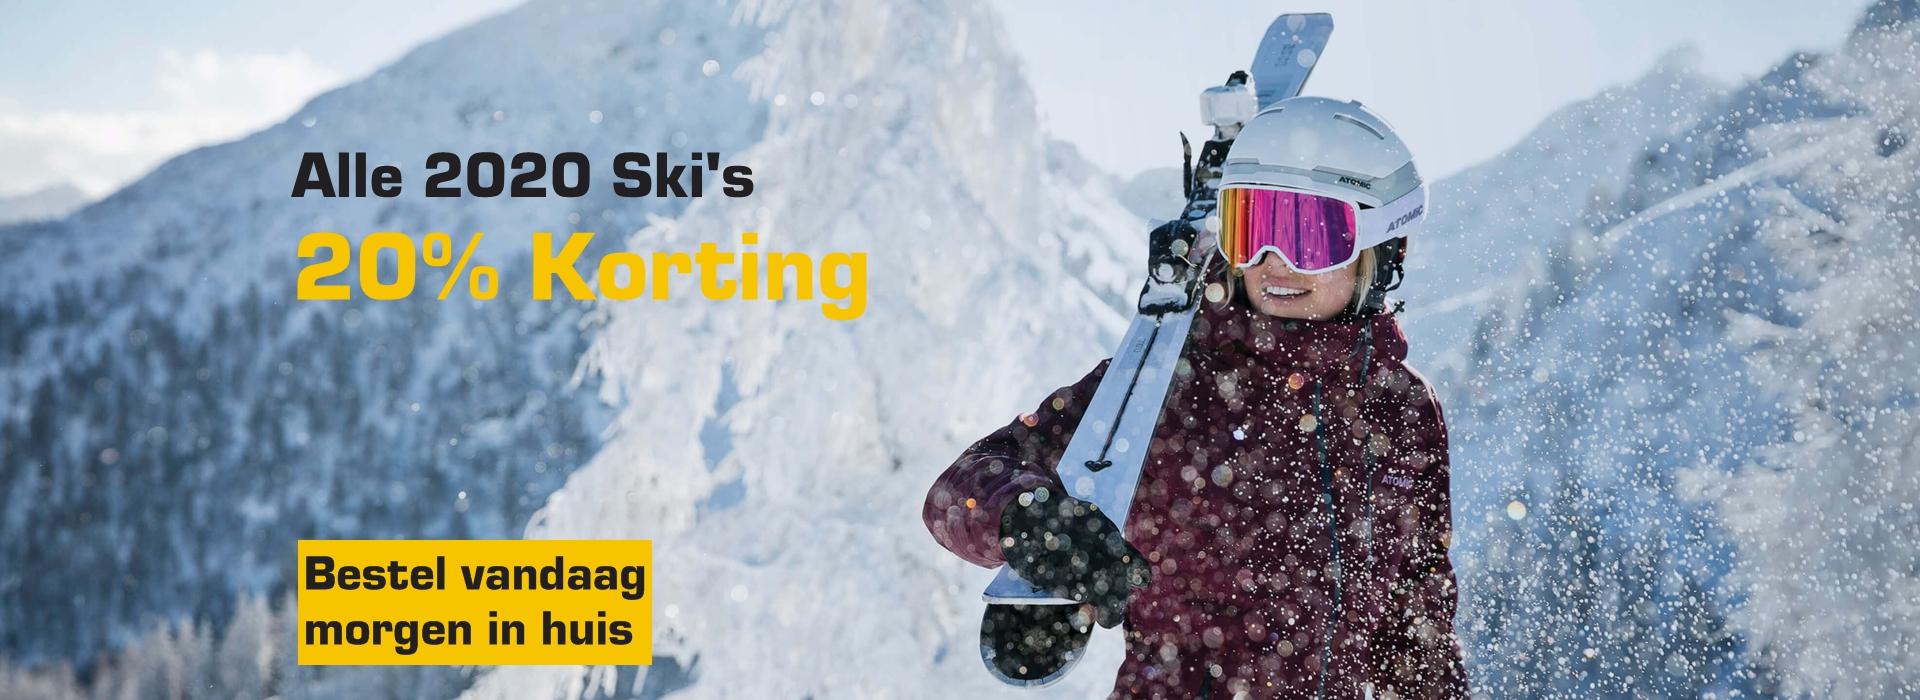 Ski's 20%